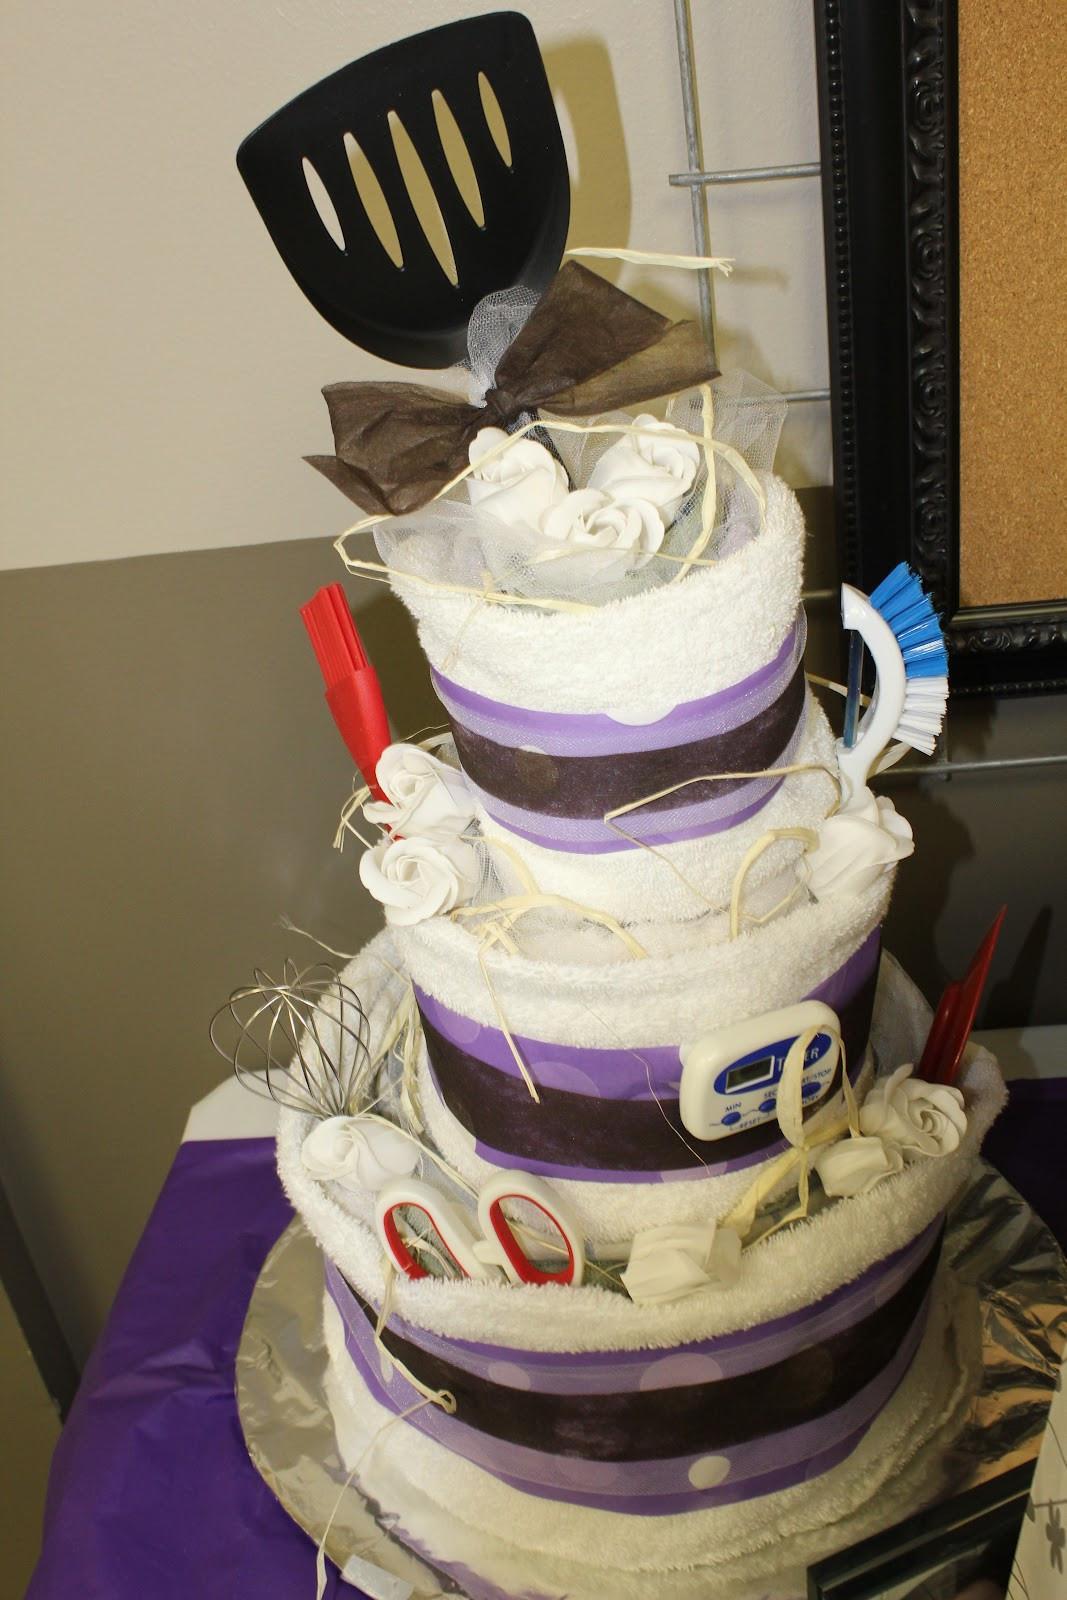 Wedding Towel Cakes Ideas  Pin Bridal Shower Towel Cakes – New Gift Ideas Creative